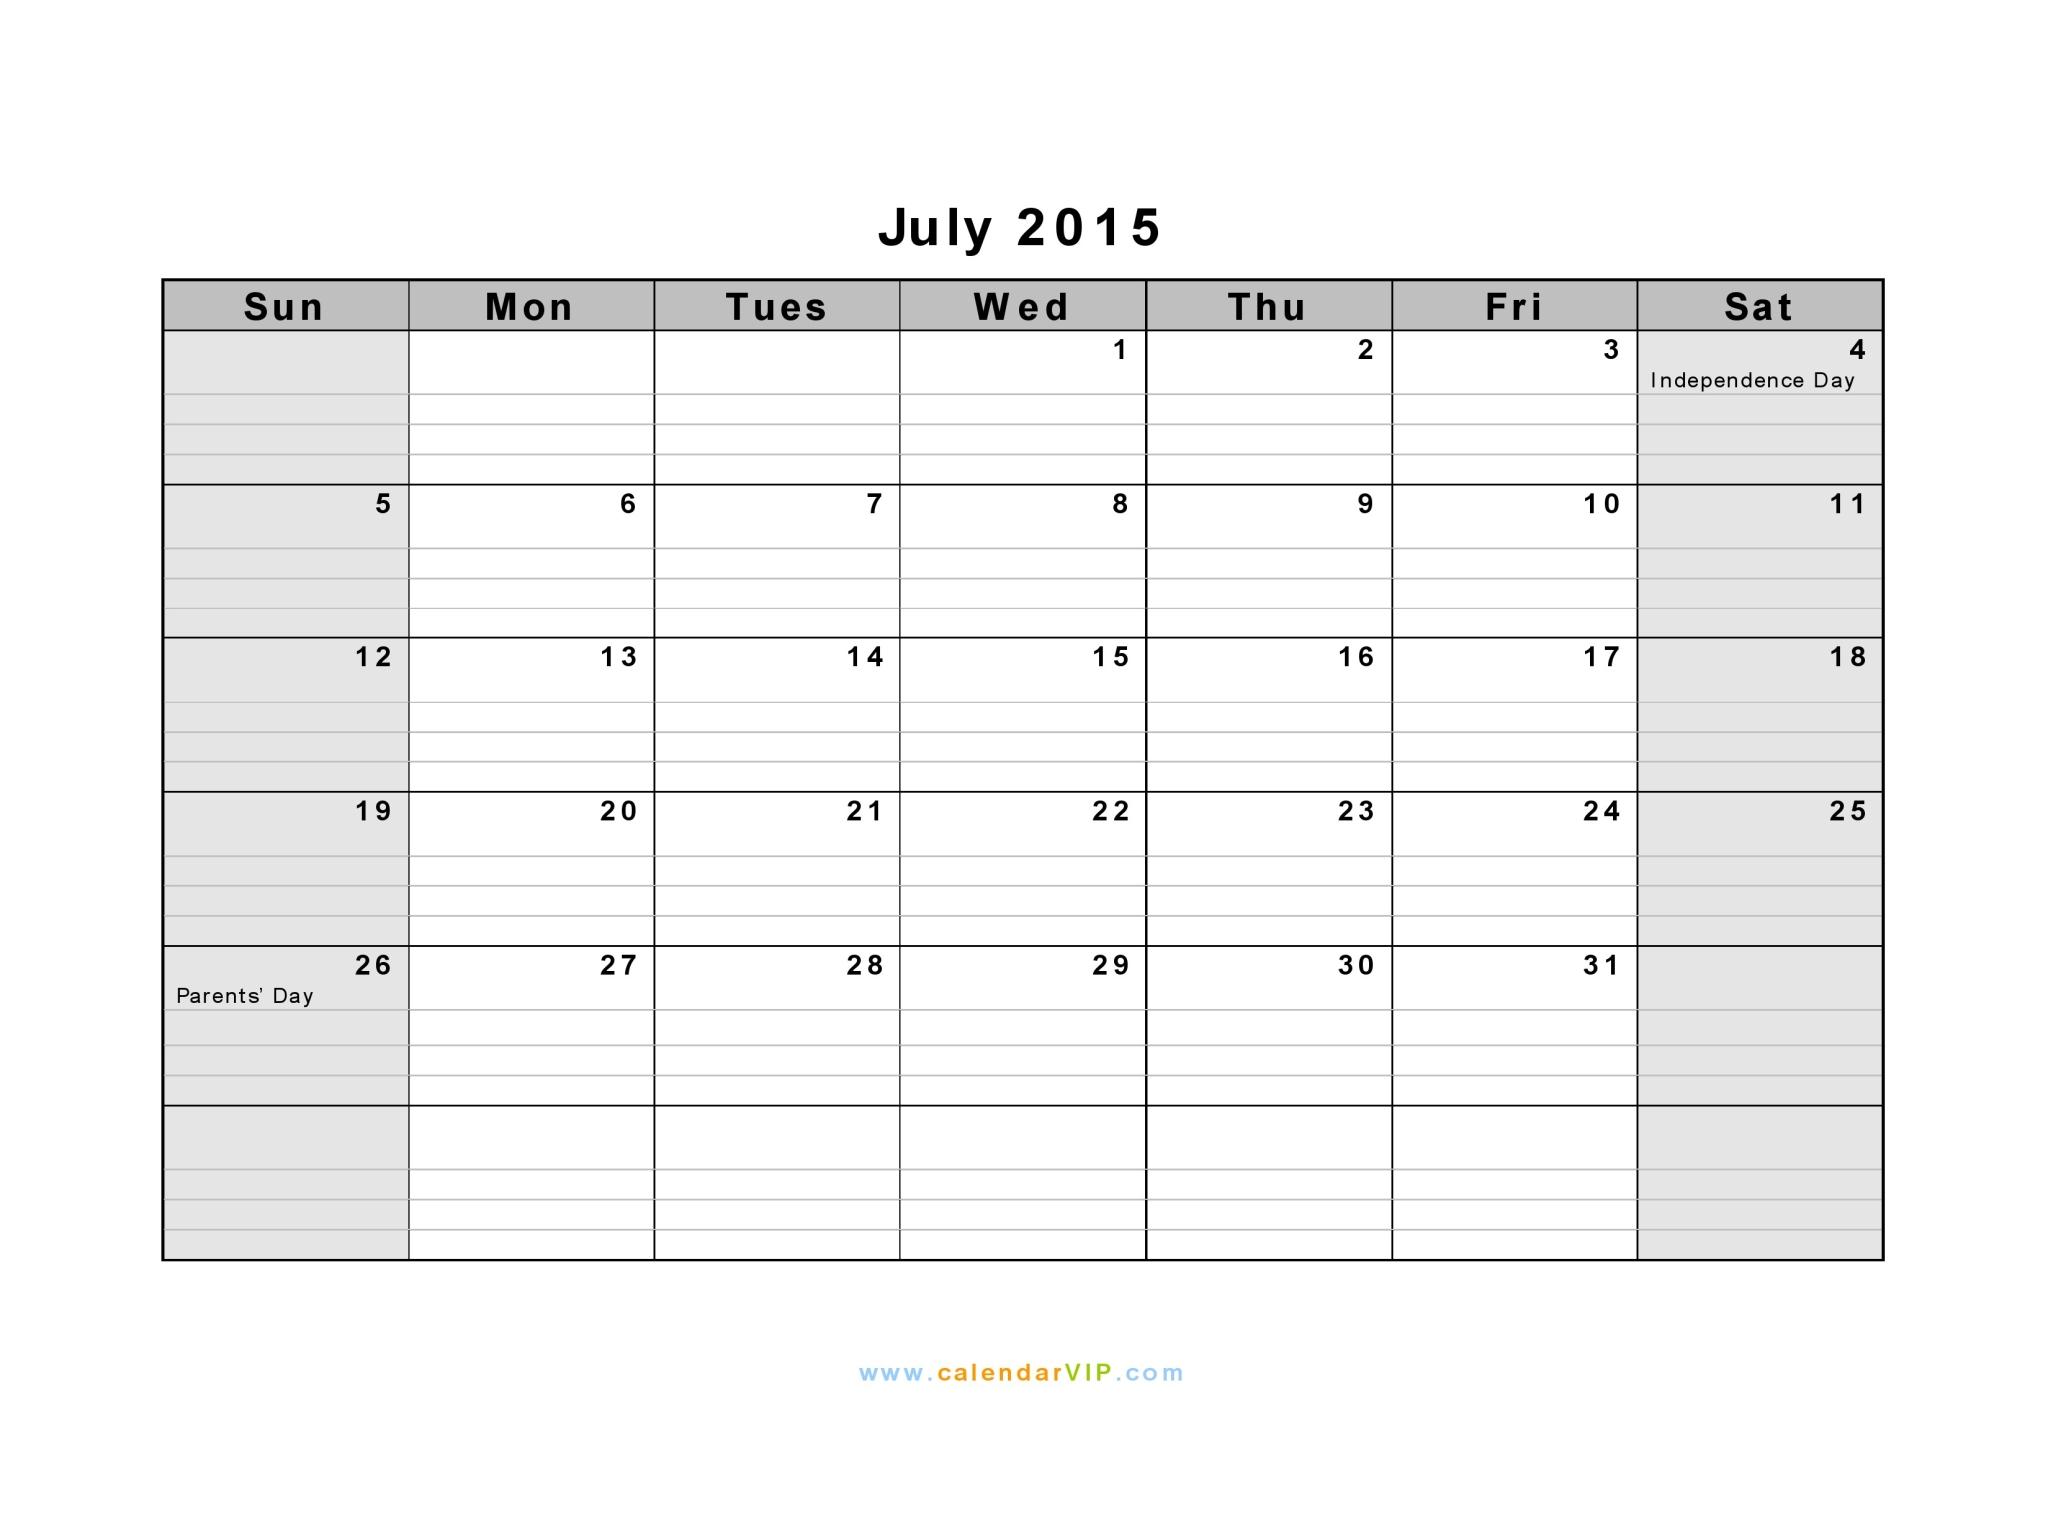 july 2015 calendar july 2015 calendar july 2015 calendar calendar template